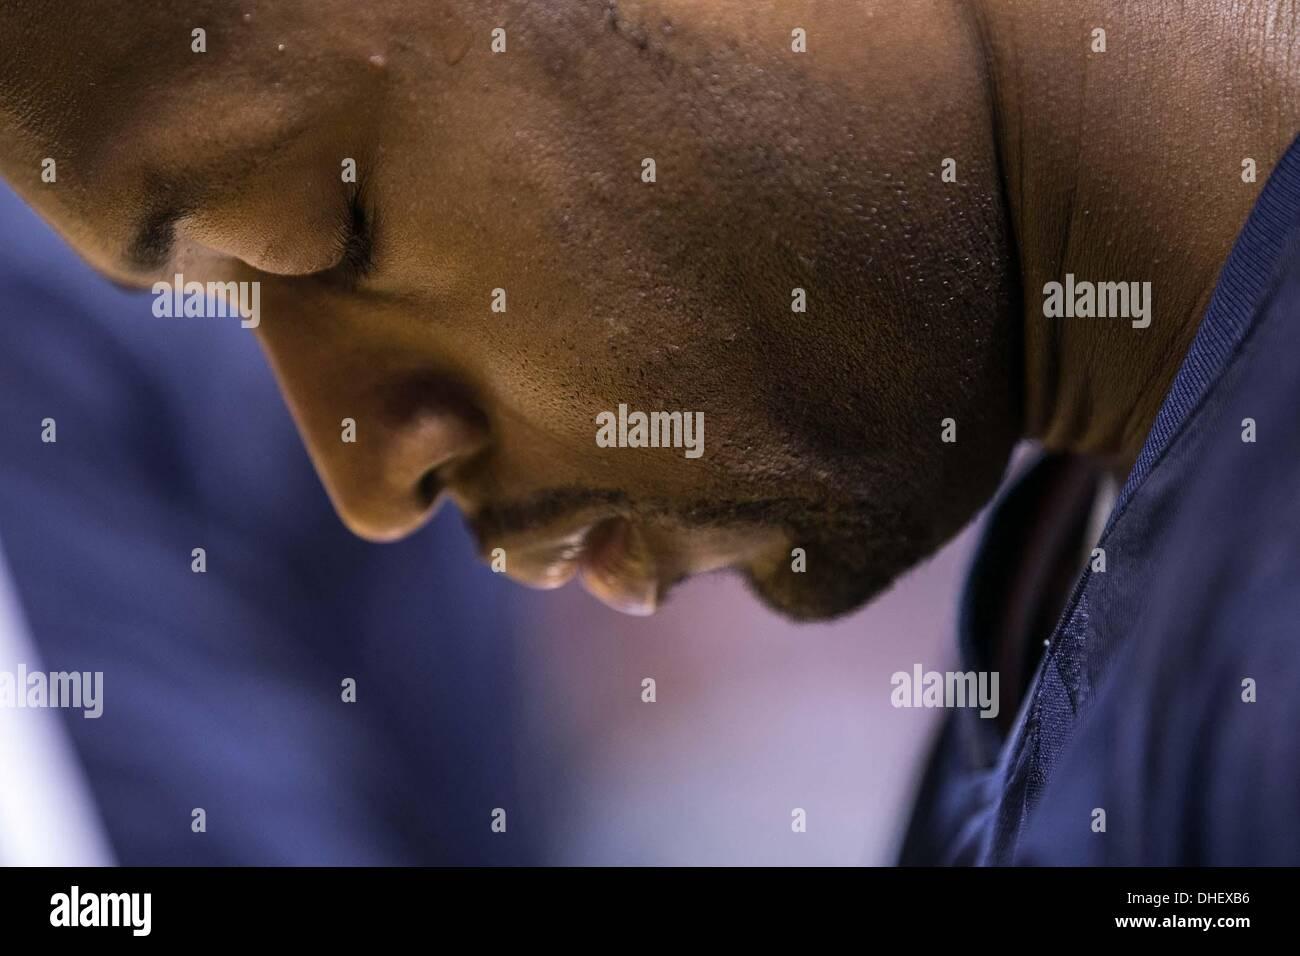 Miami, Florida, USA. 7th Nov, 2013. Miami Heat shooting guard Dwyane Wade (3) during the National Anthem at AmericanAirlines Stock Photo